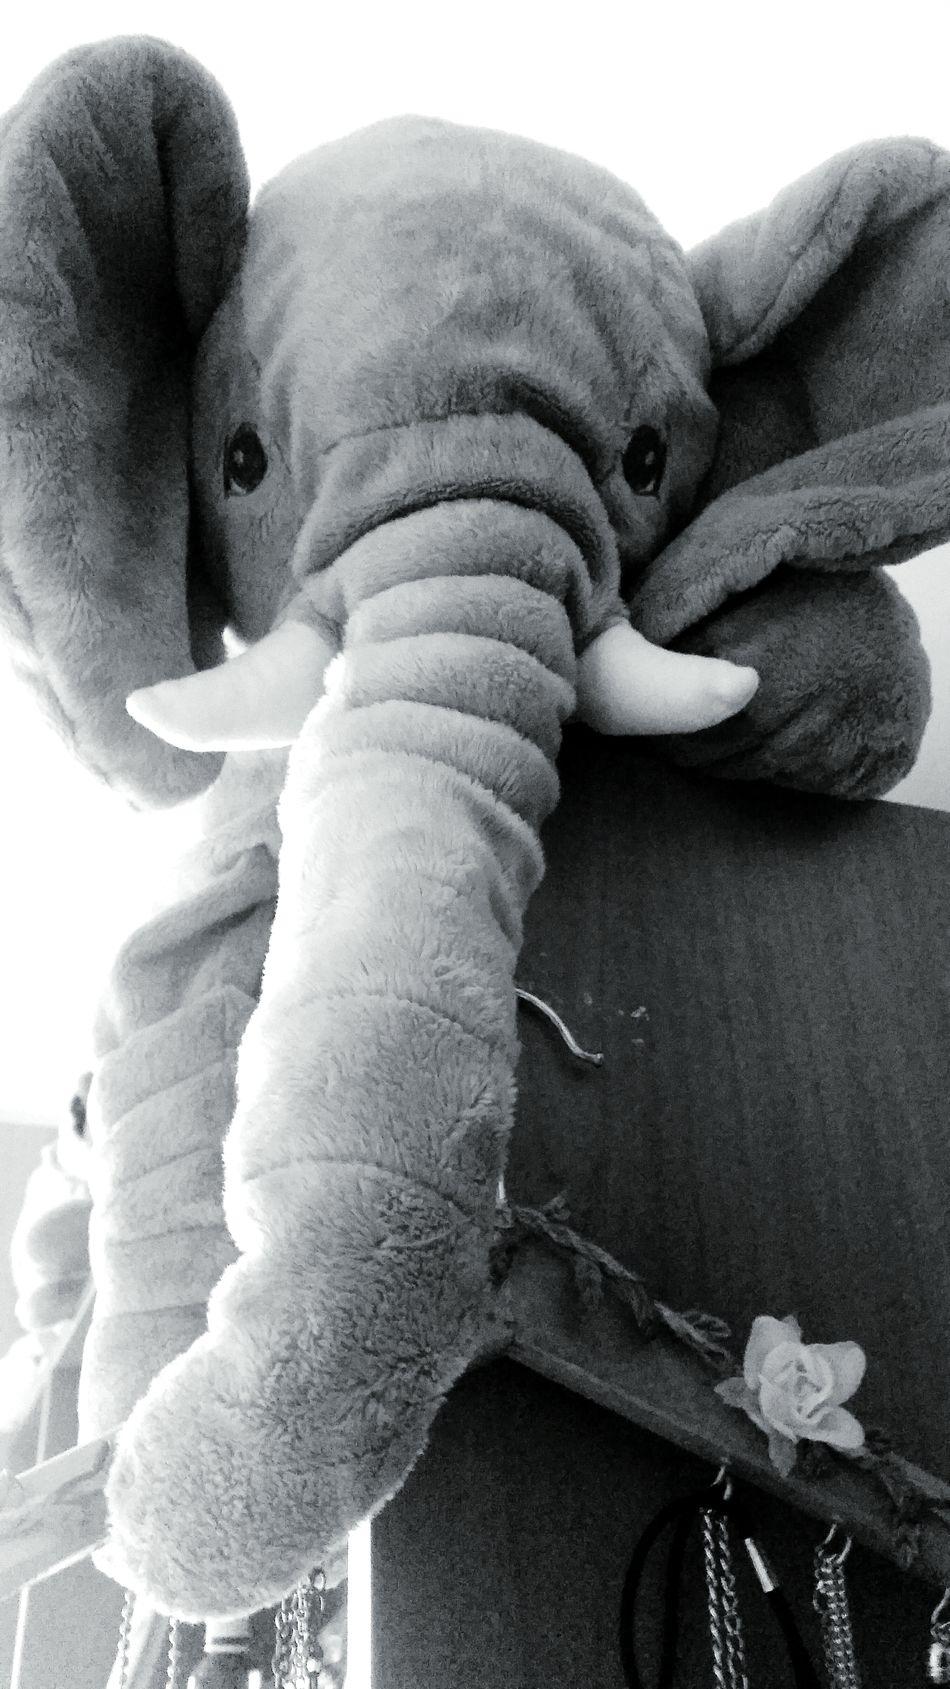 Lovely Elephant ♥ Pupazzi Morbidezza So Sweet ♥ Occhi Dolci Animals